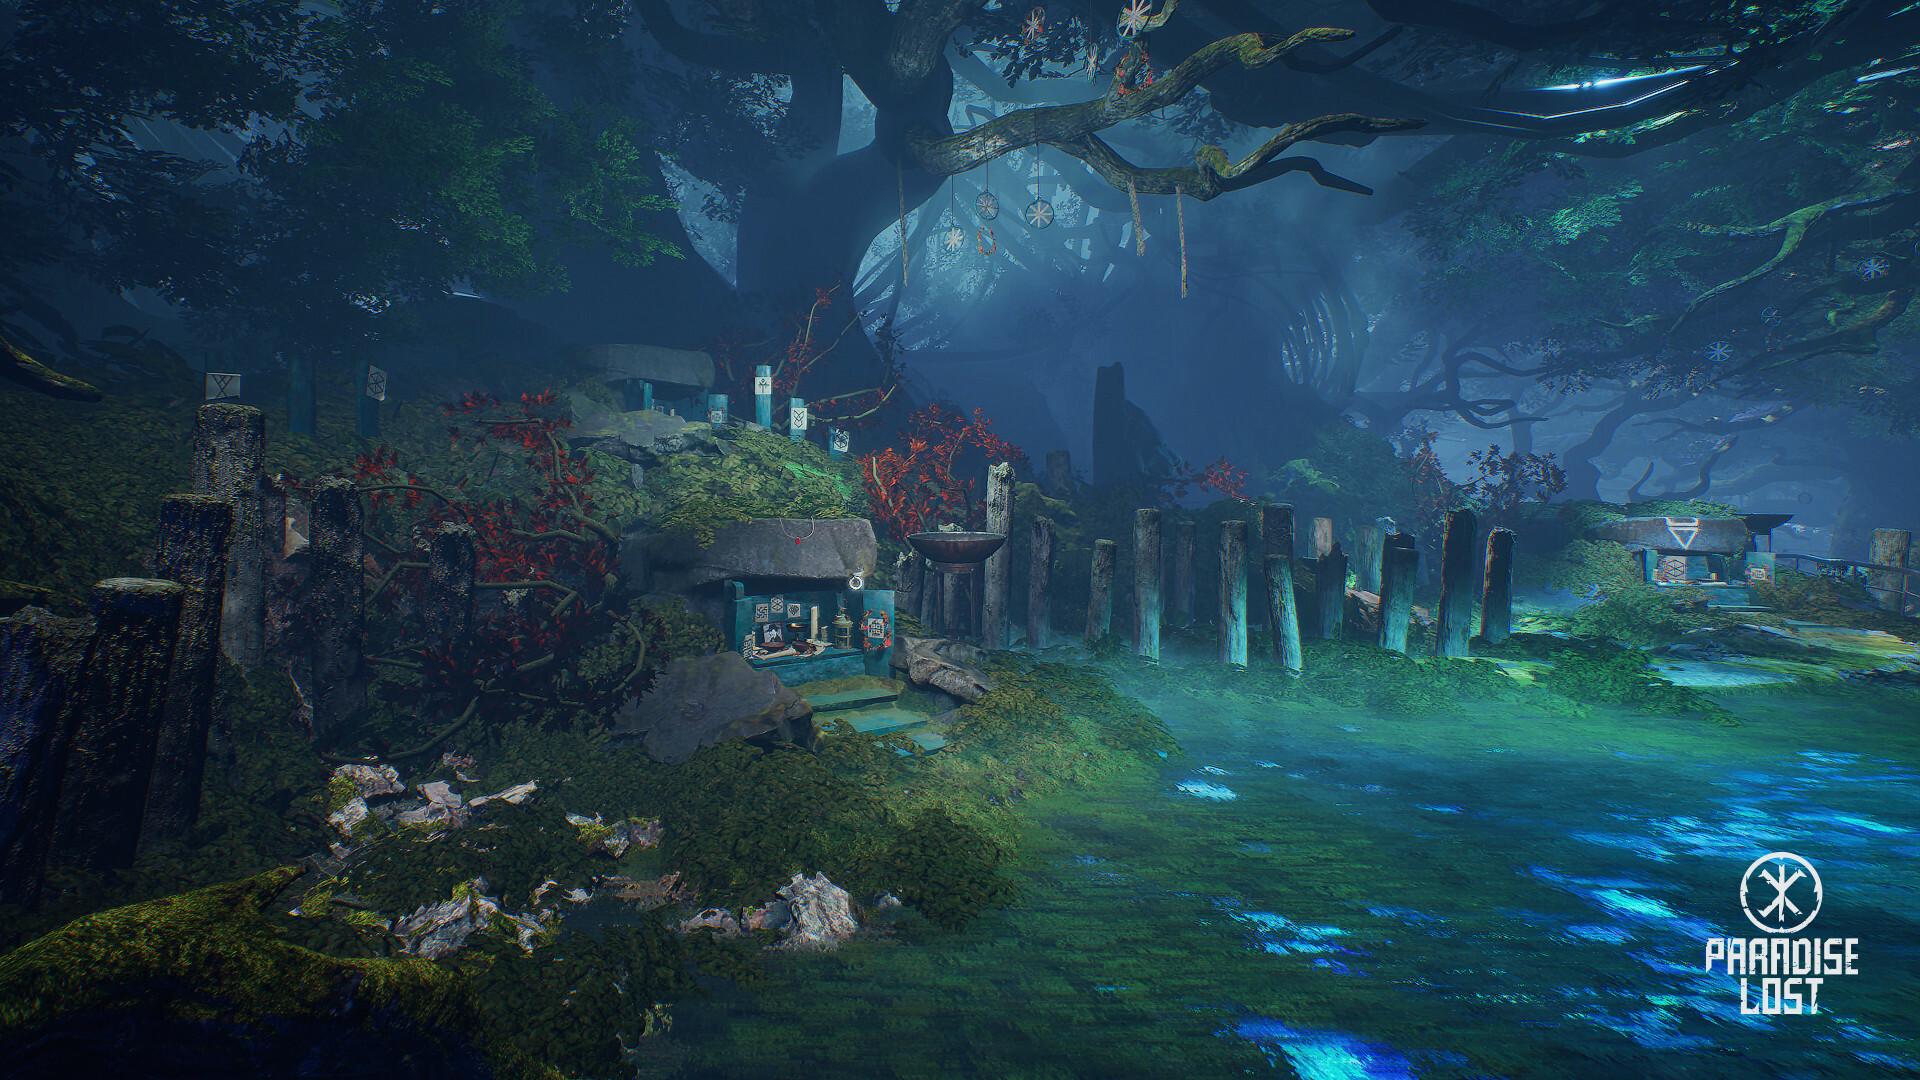 paradise-lost-pc-screenshot-1